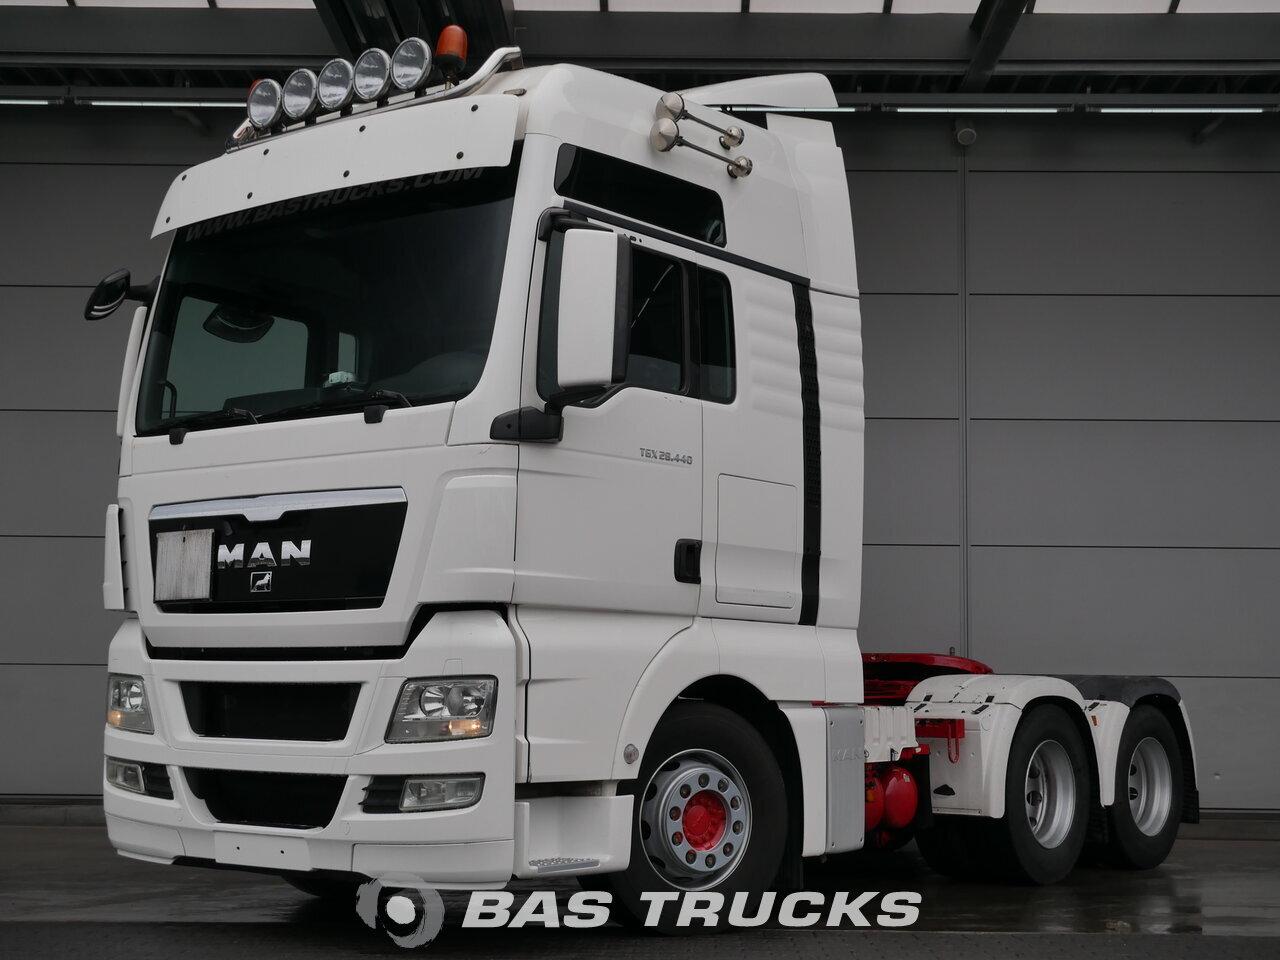 man tgx xxl tractorhead euro norm 5 24400 bas trucks. Black Bedroom Furniture Sets. Home Design Ideas